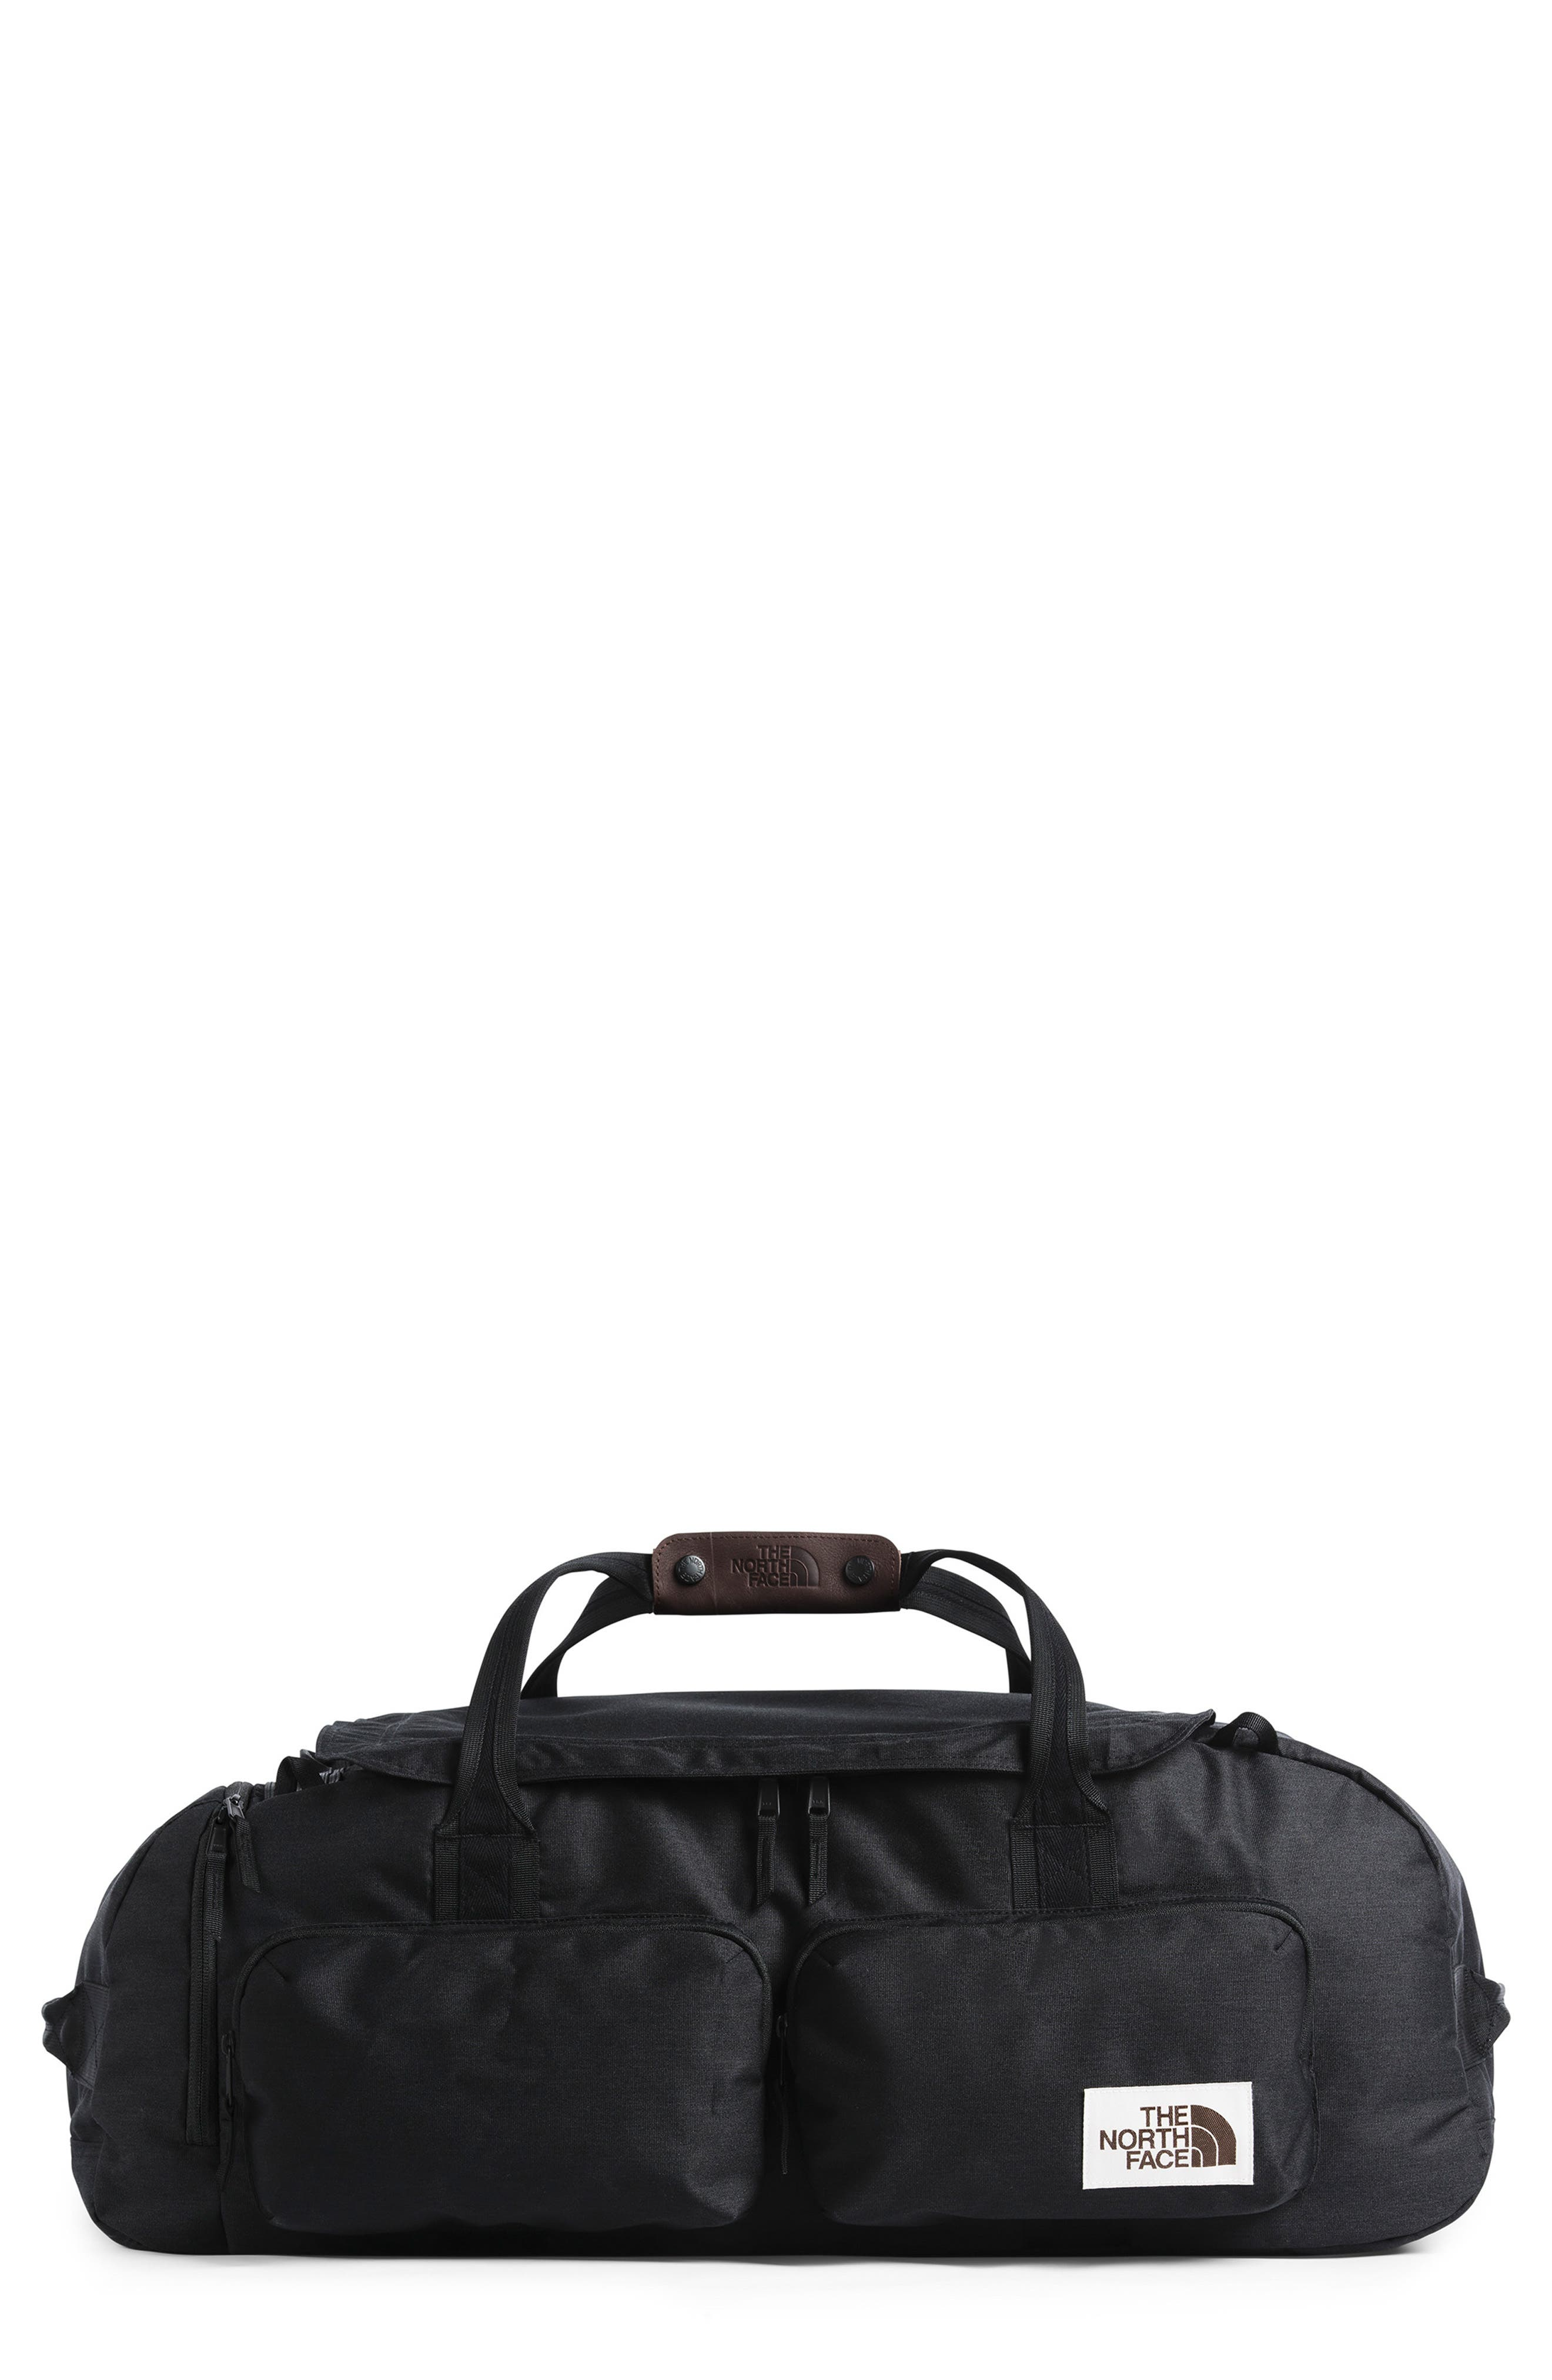 THE NORTH FACE Berkeley Duffle Bag, Main, color, BLACK HEATHER